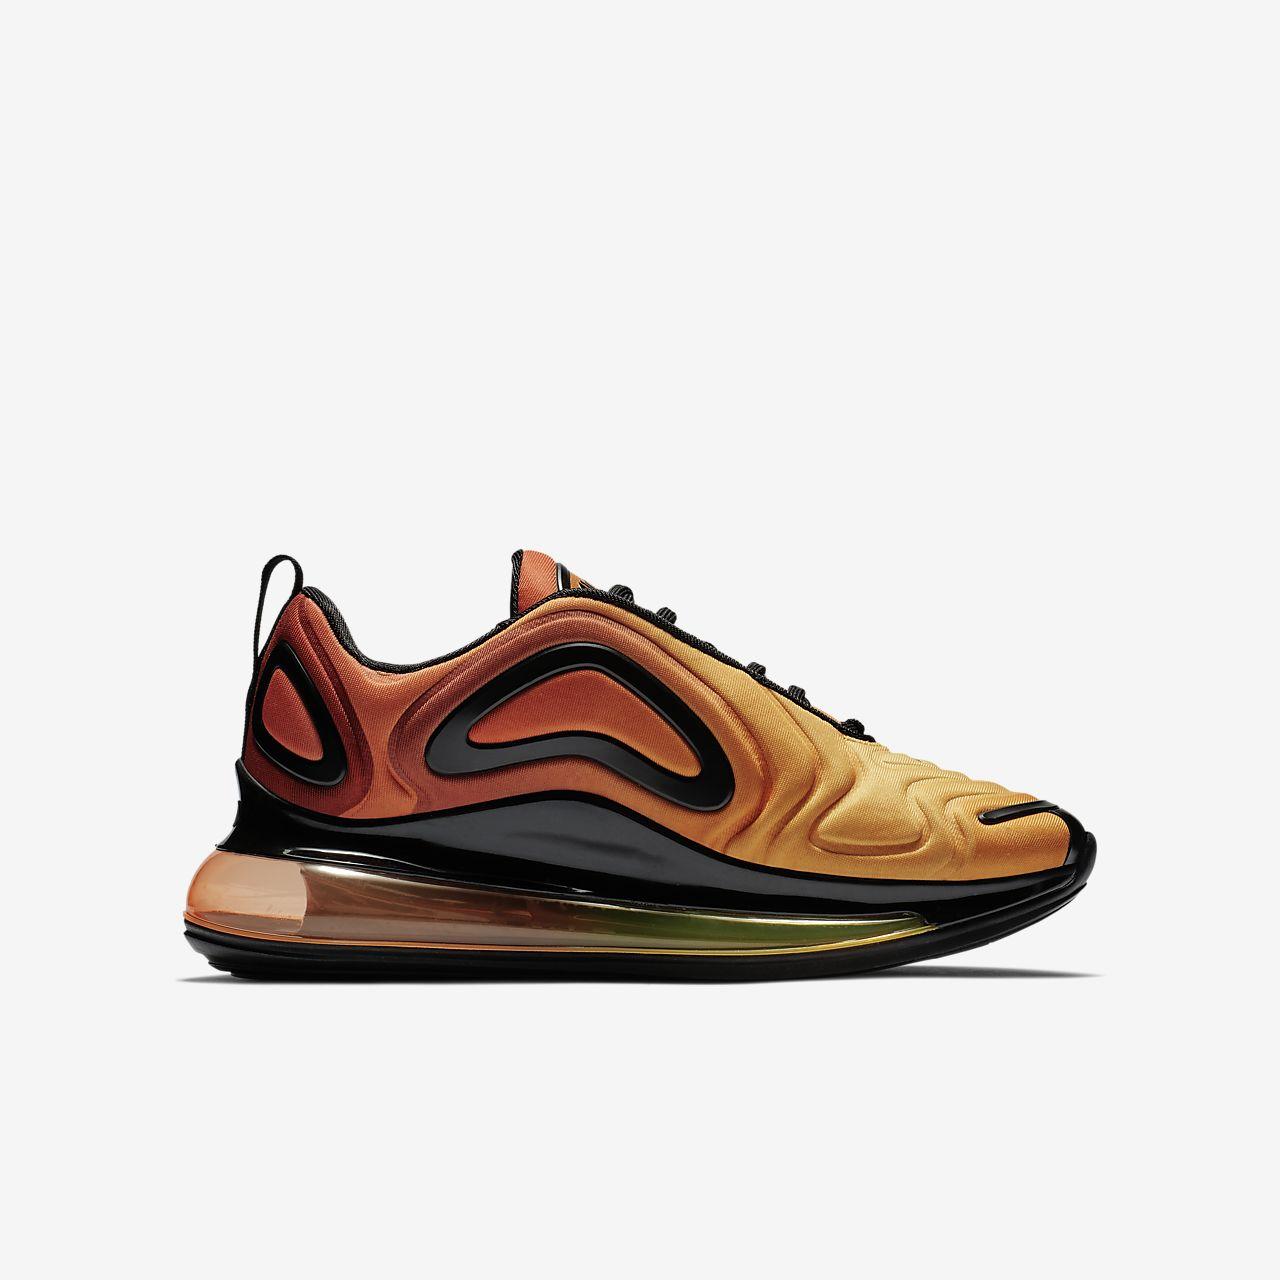 sports shoes 044cc b9dda Scarpa Nike Air Max 720 , Bambini Ragazzi ...